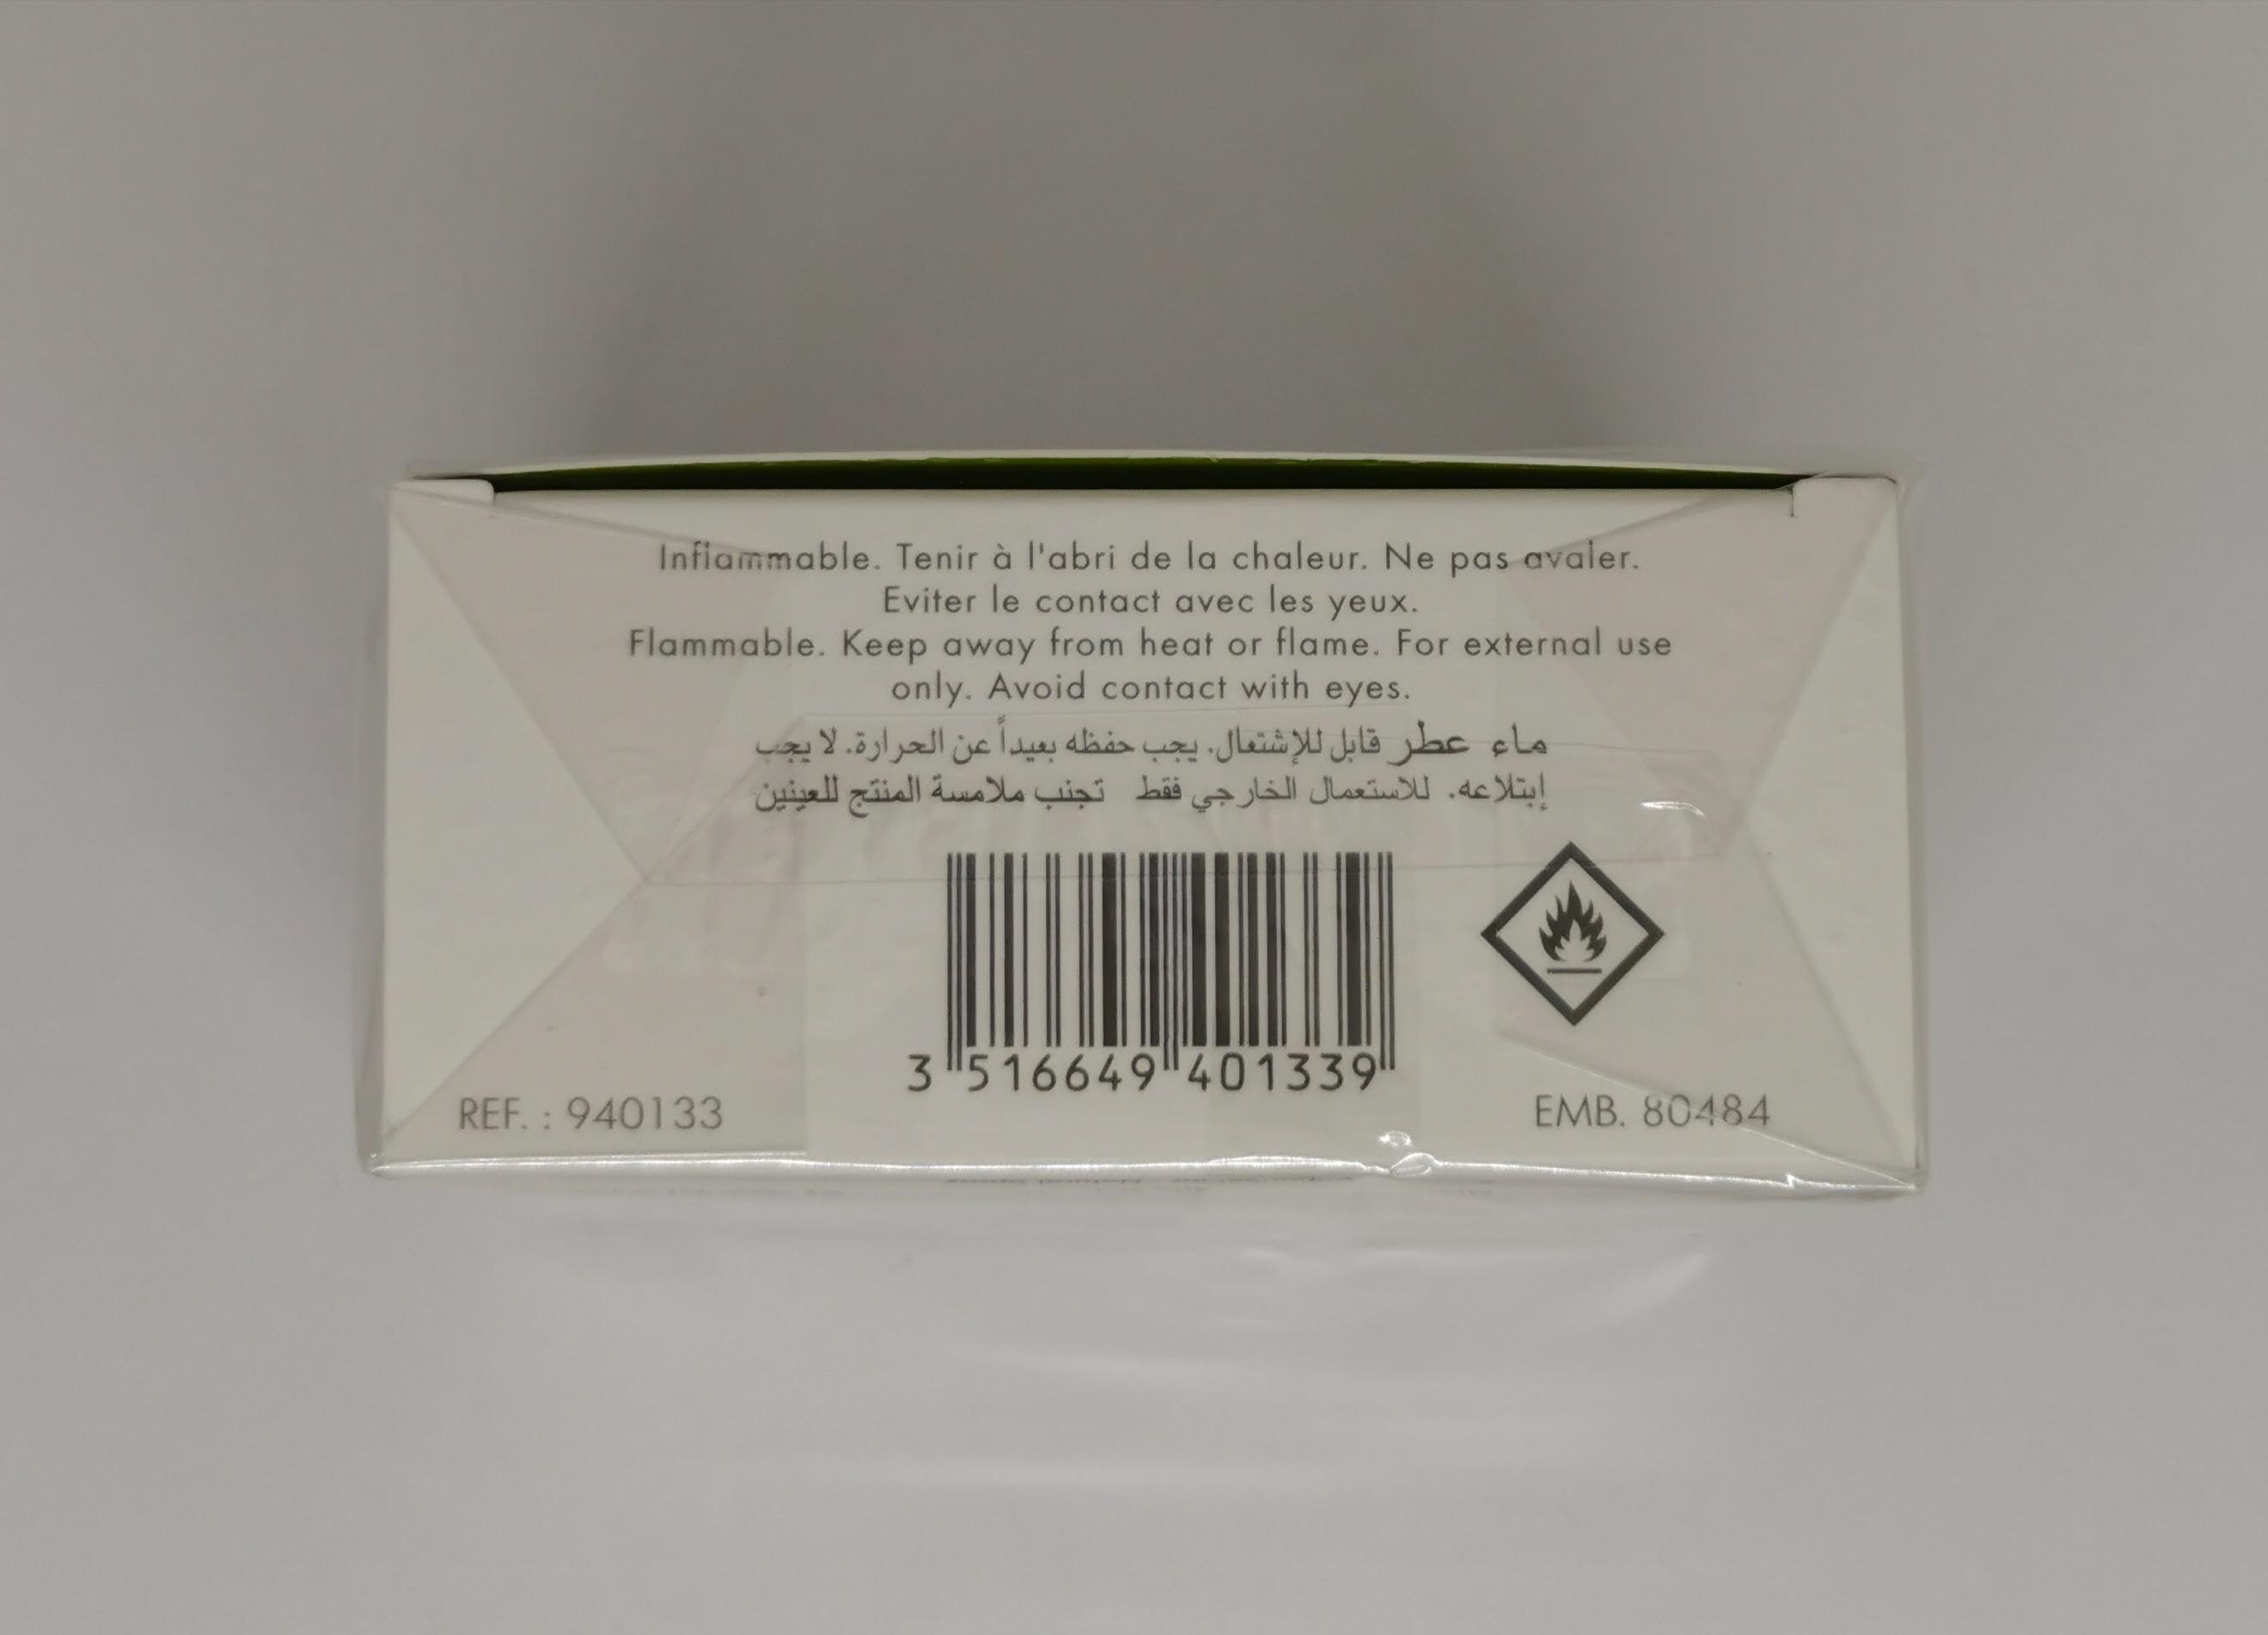 Парфюмерная вода 50 мл Franck Olivier Franck Olivier - фото штрих-кода на коробке